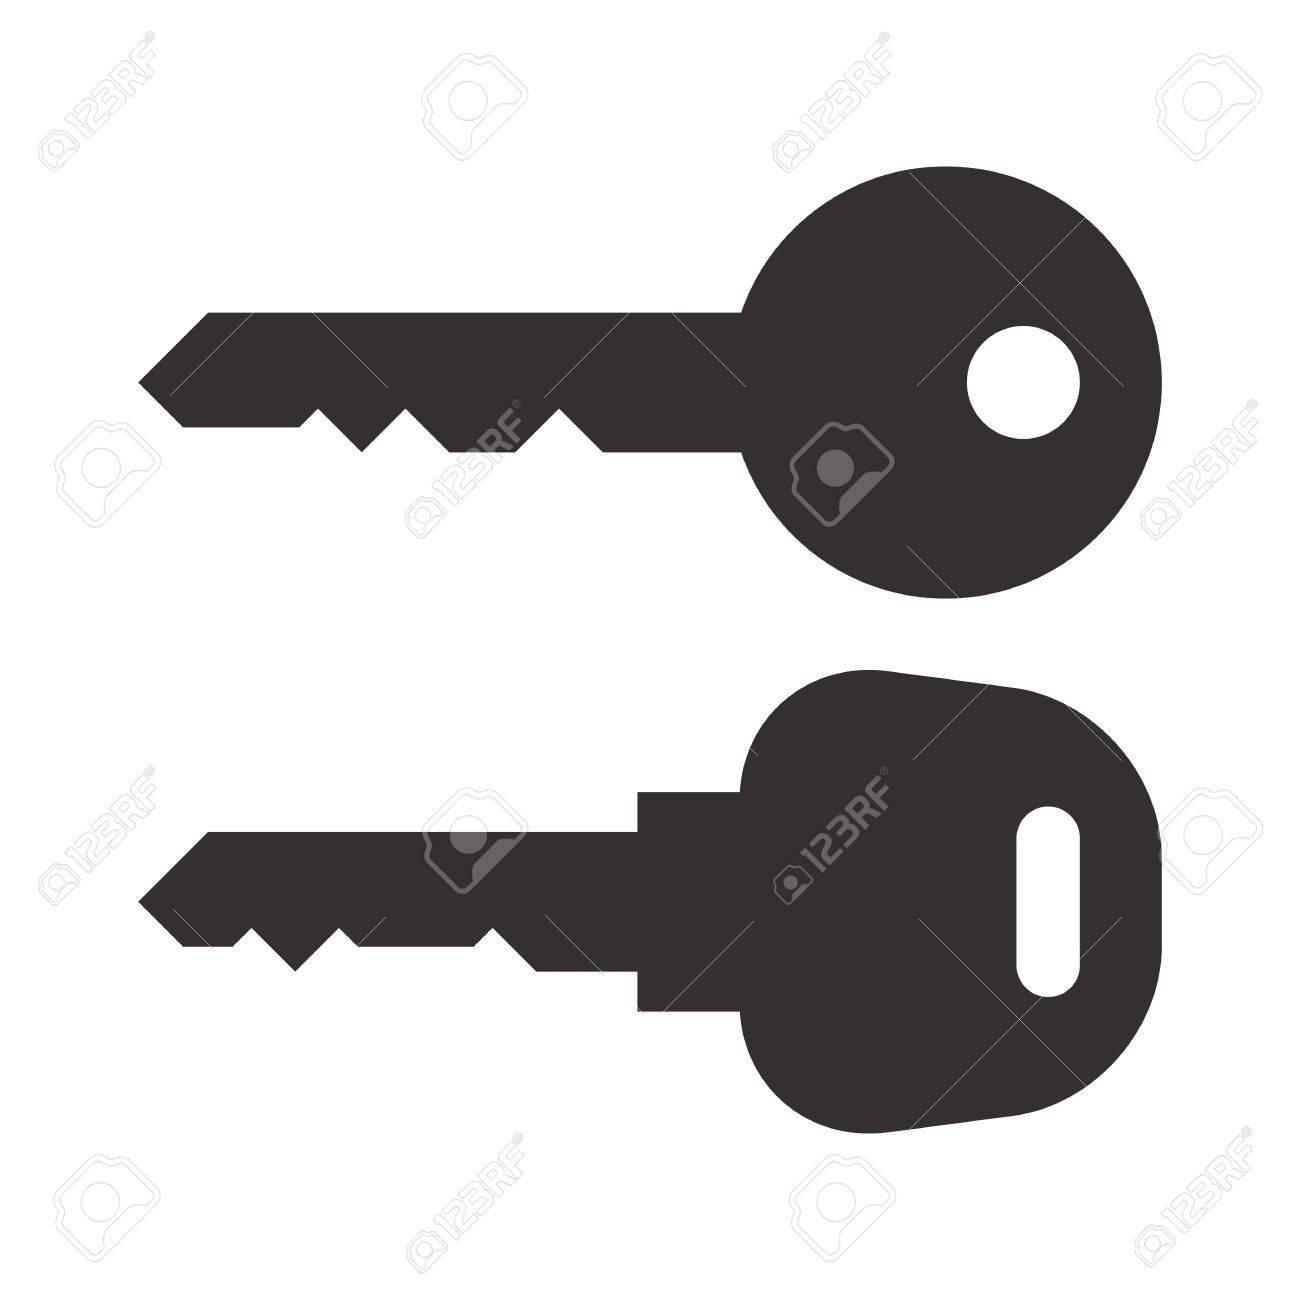 Key and car key symbols isolated on white background royalty free key and car key symbols isolated on white background stock vector 22717684 biocorpaavc Gallery